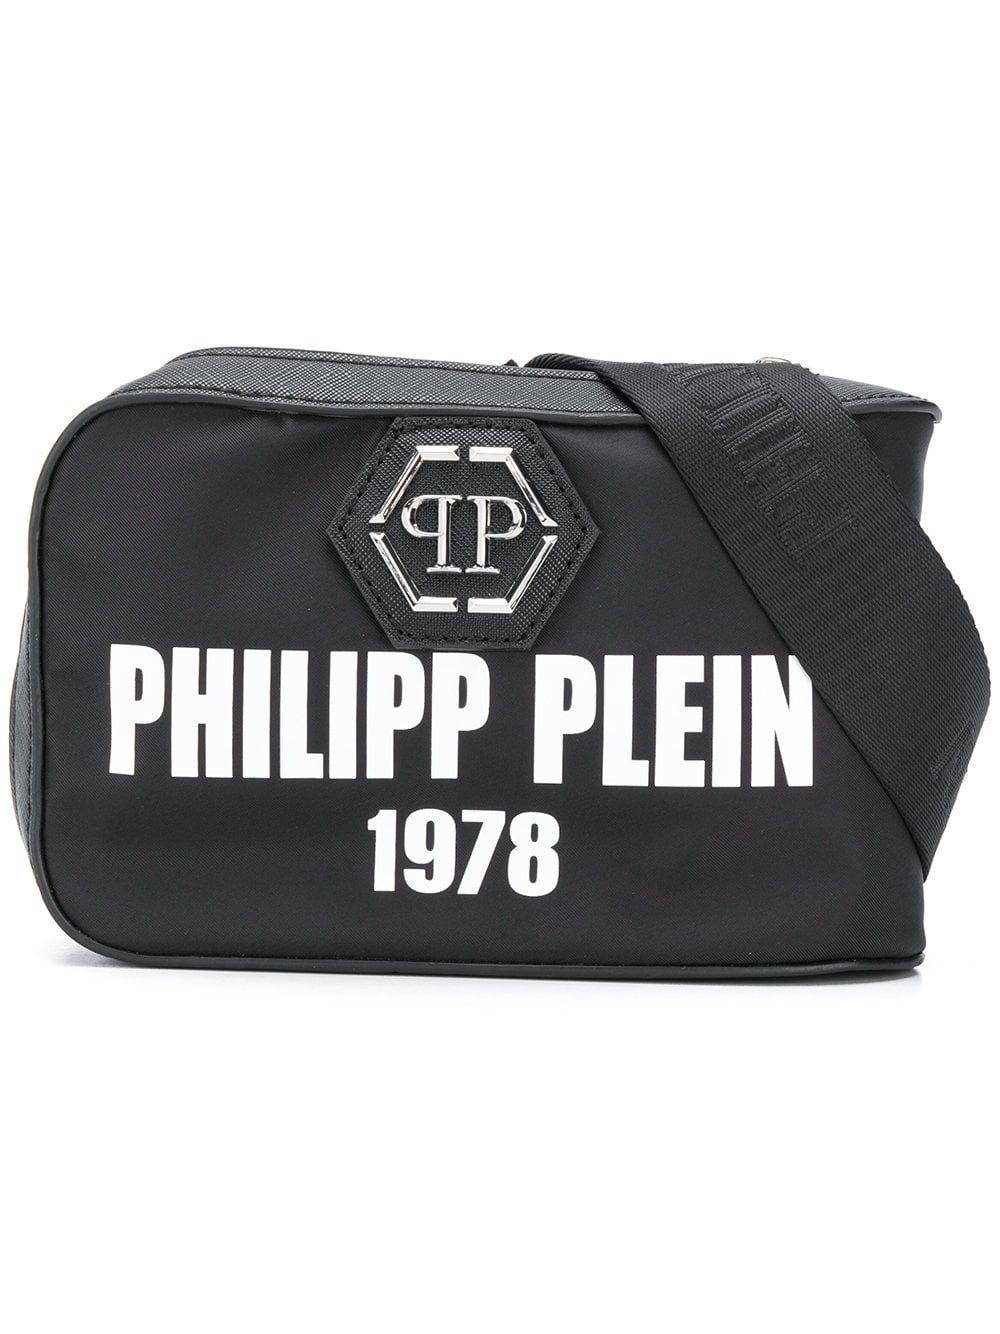 383e24f803 PHILIPP PLEIN logo zipped wash bag. #philippplein #   Philipp Plein in 2019    Bags, Wash bags, Logos